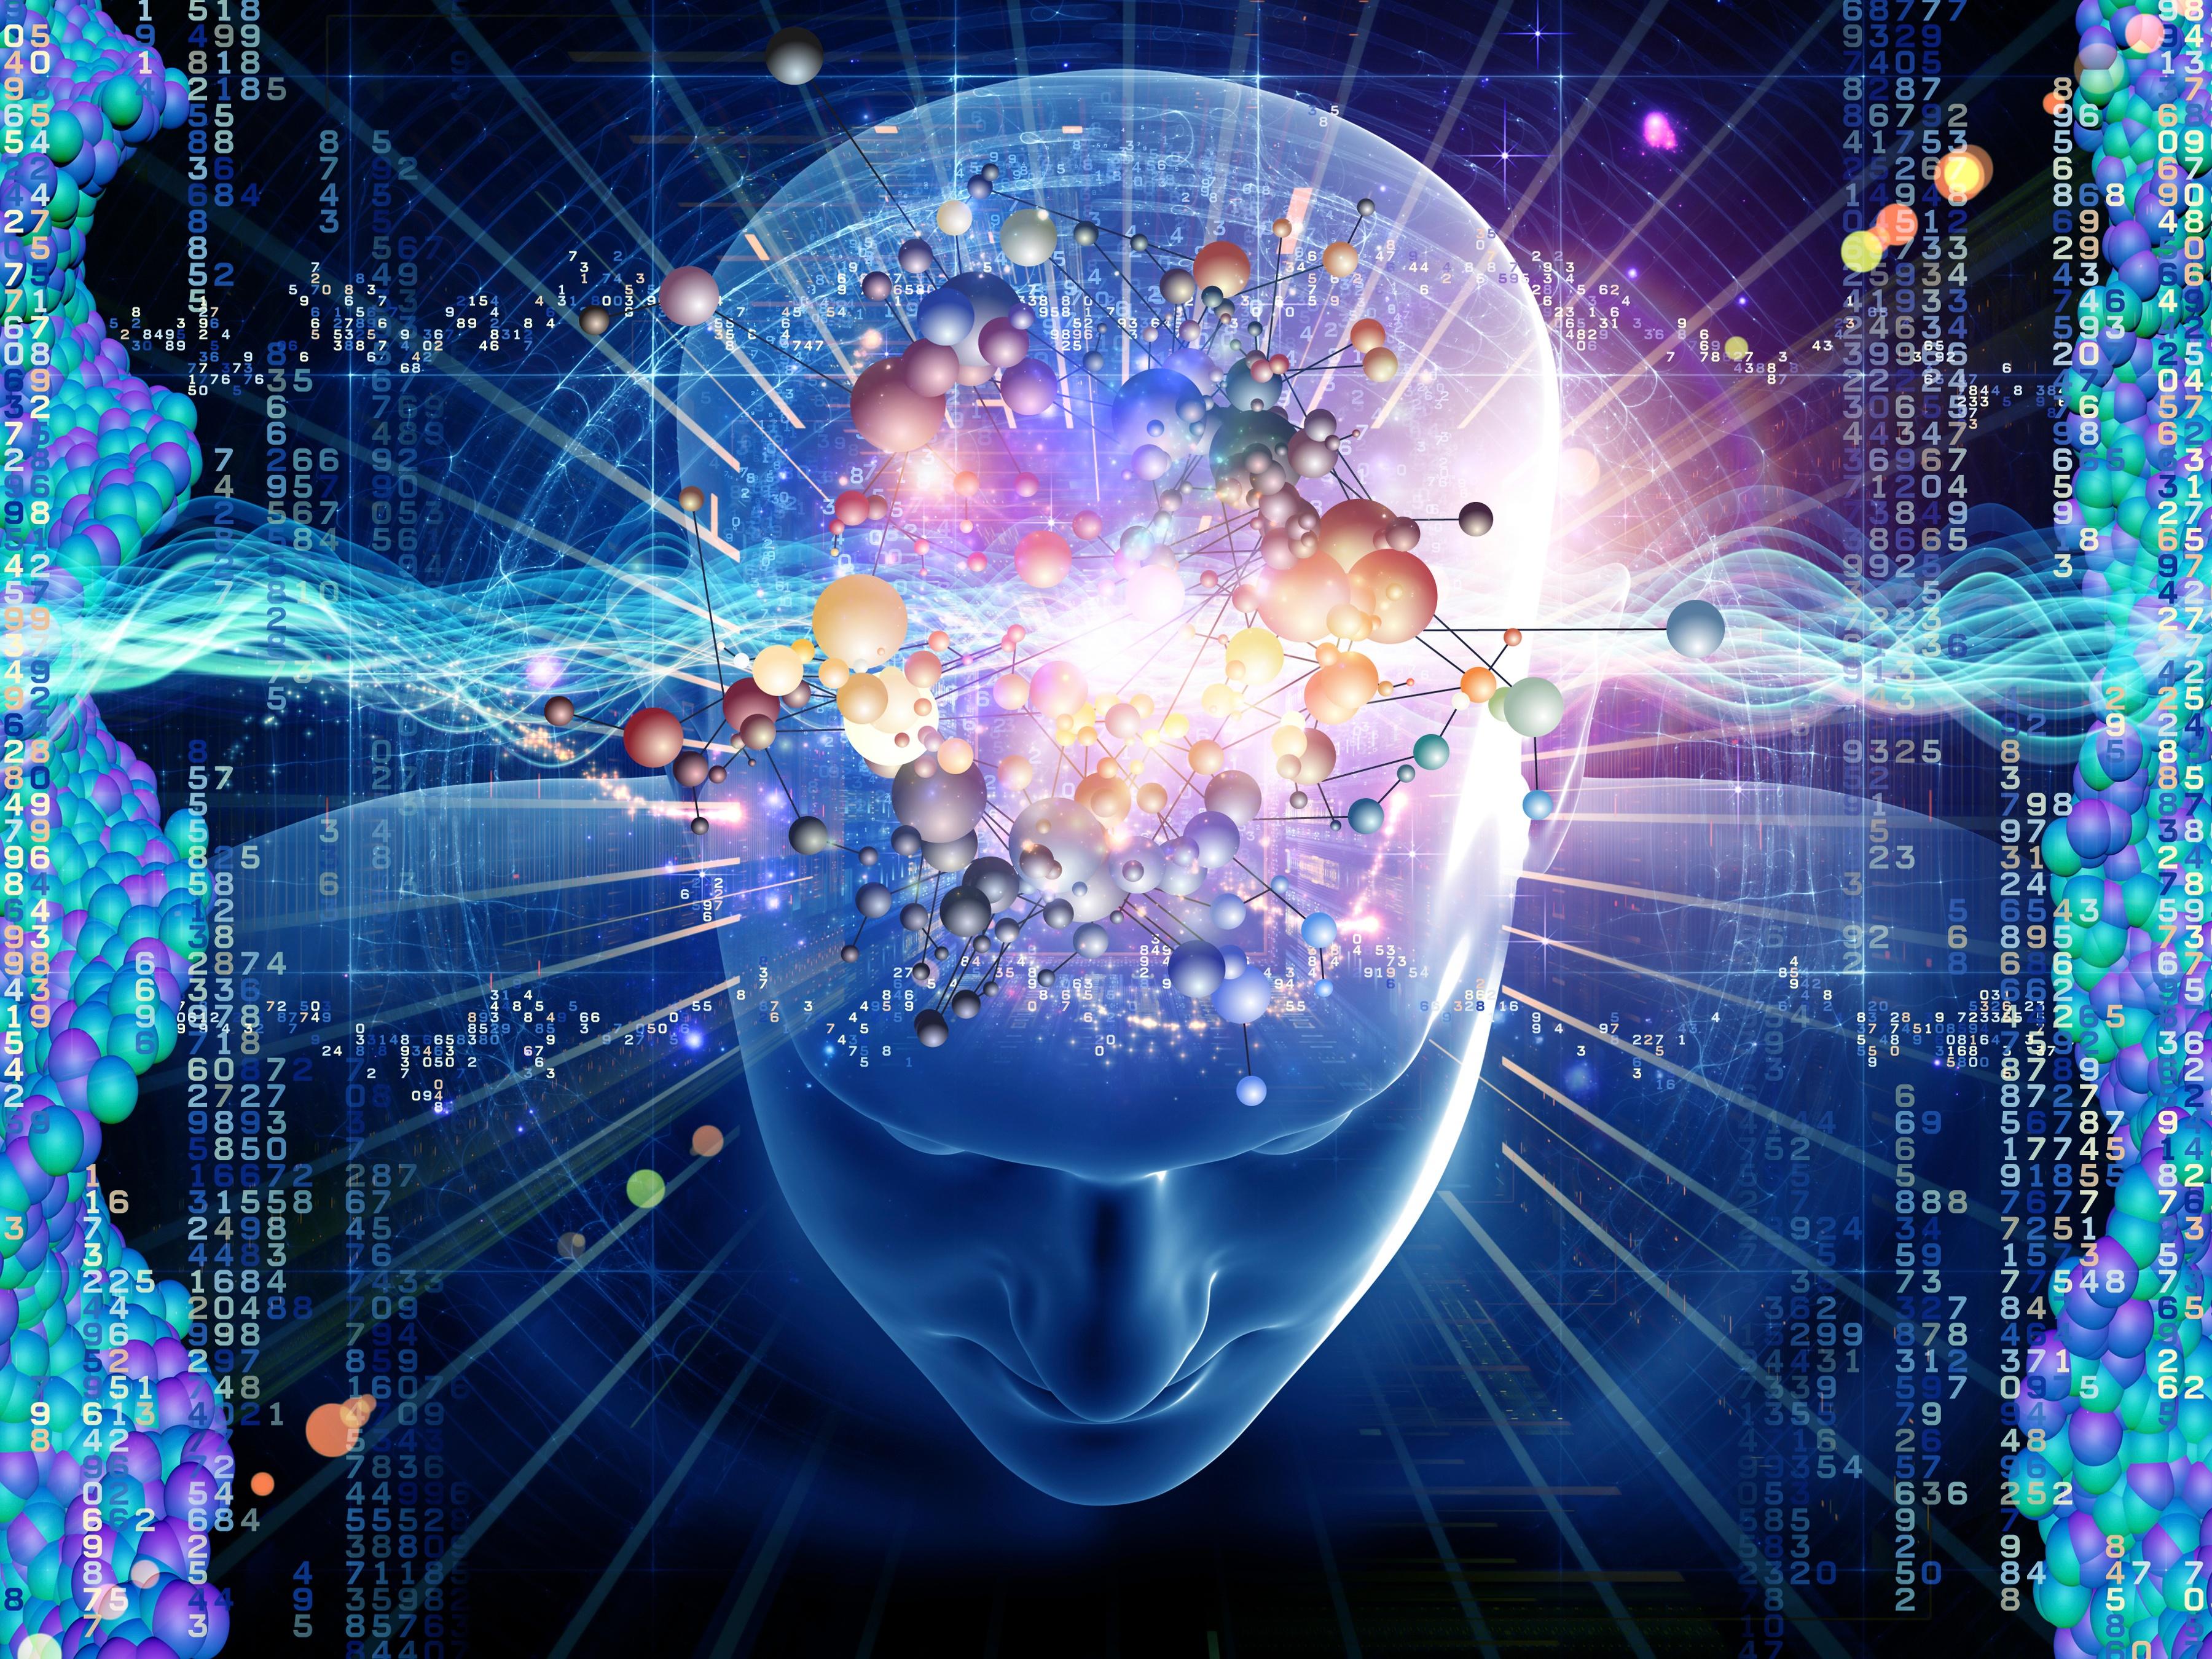 Brain hard drive of soul.jpg